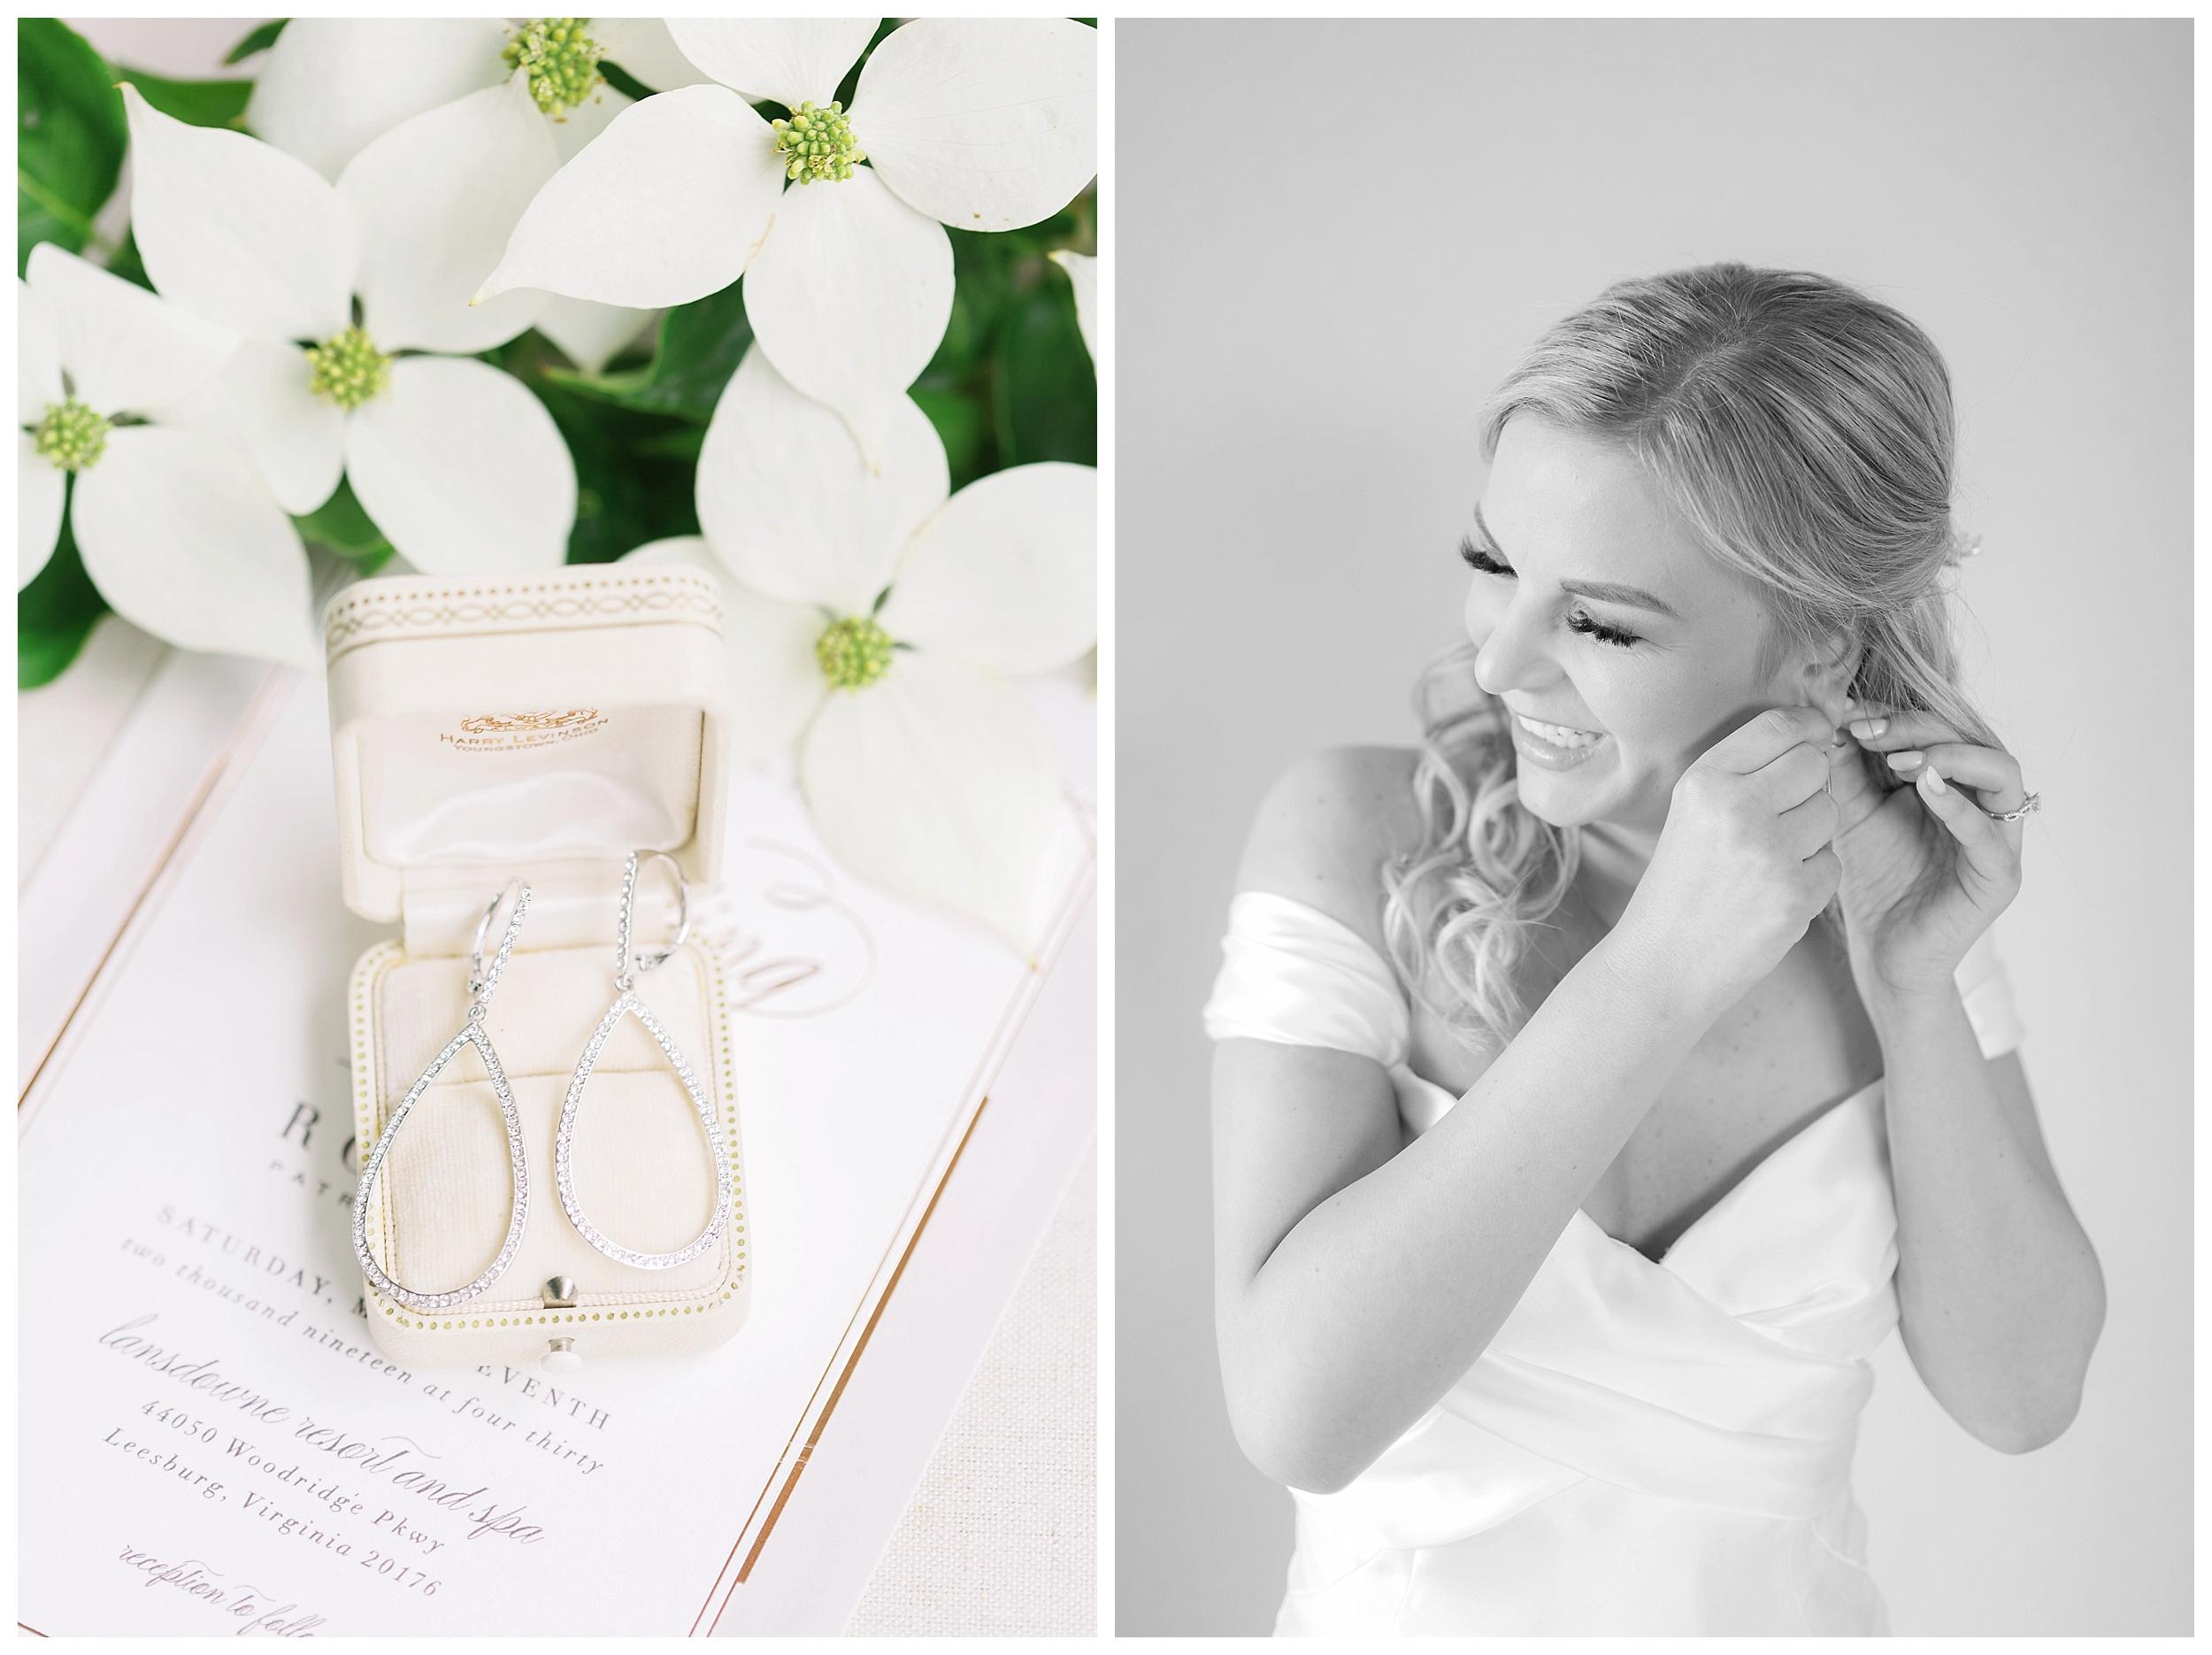 Lansdowne Resort Wedding | Virginia Film Wedding Photographer Kir Tuben_0012.jpg